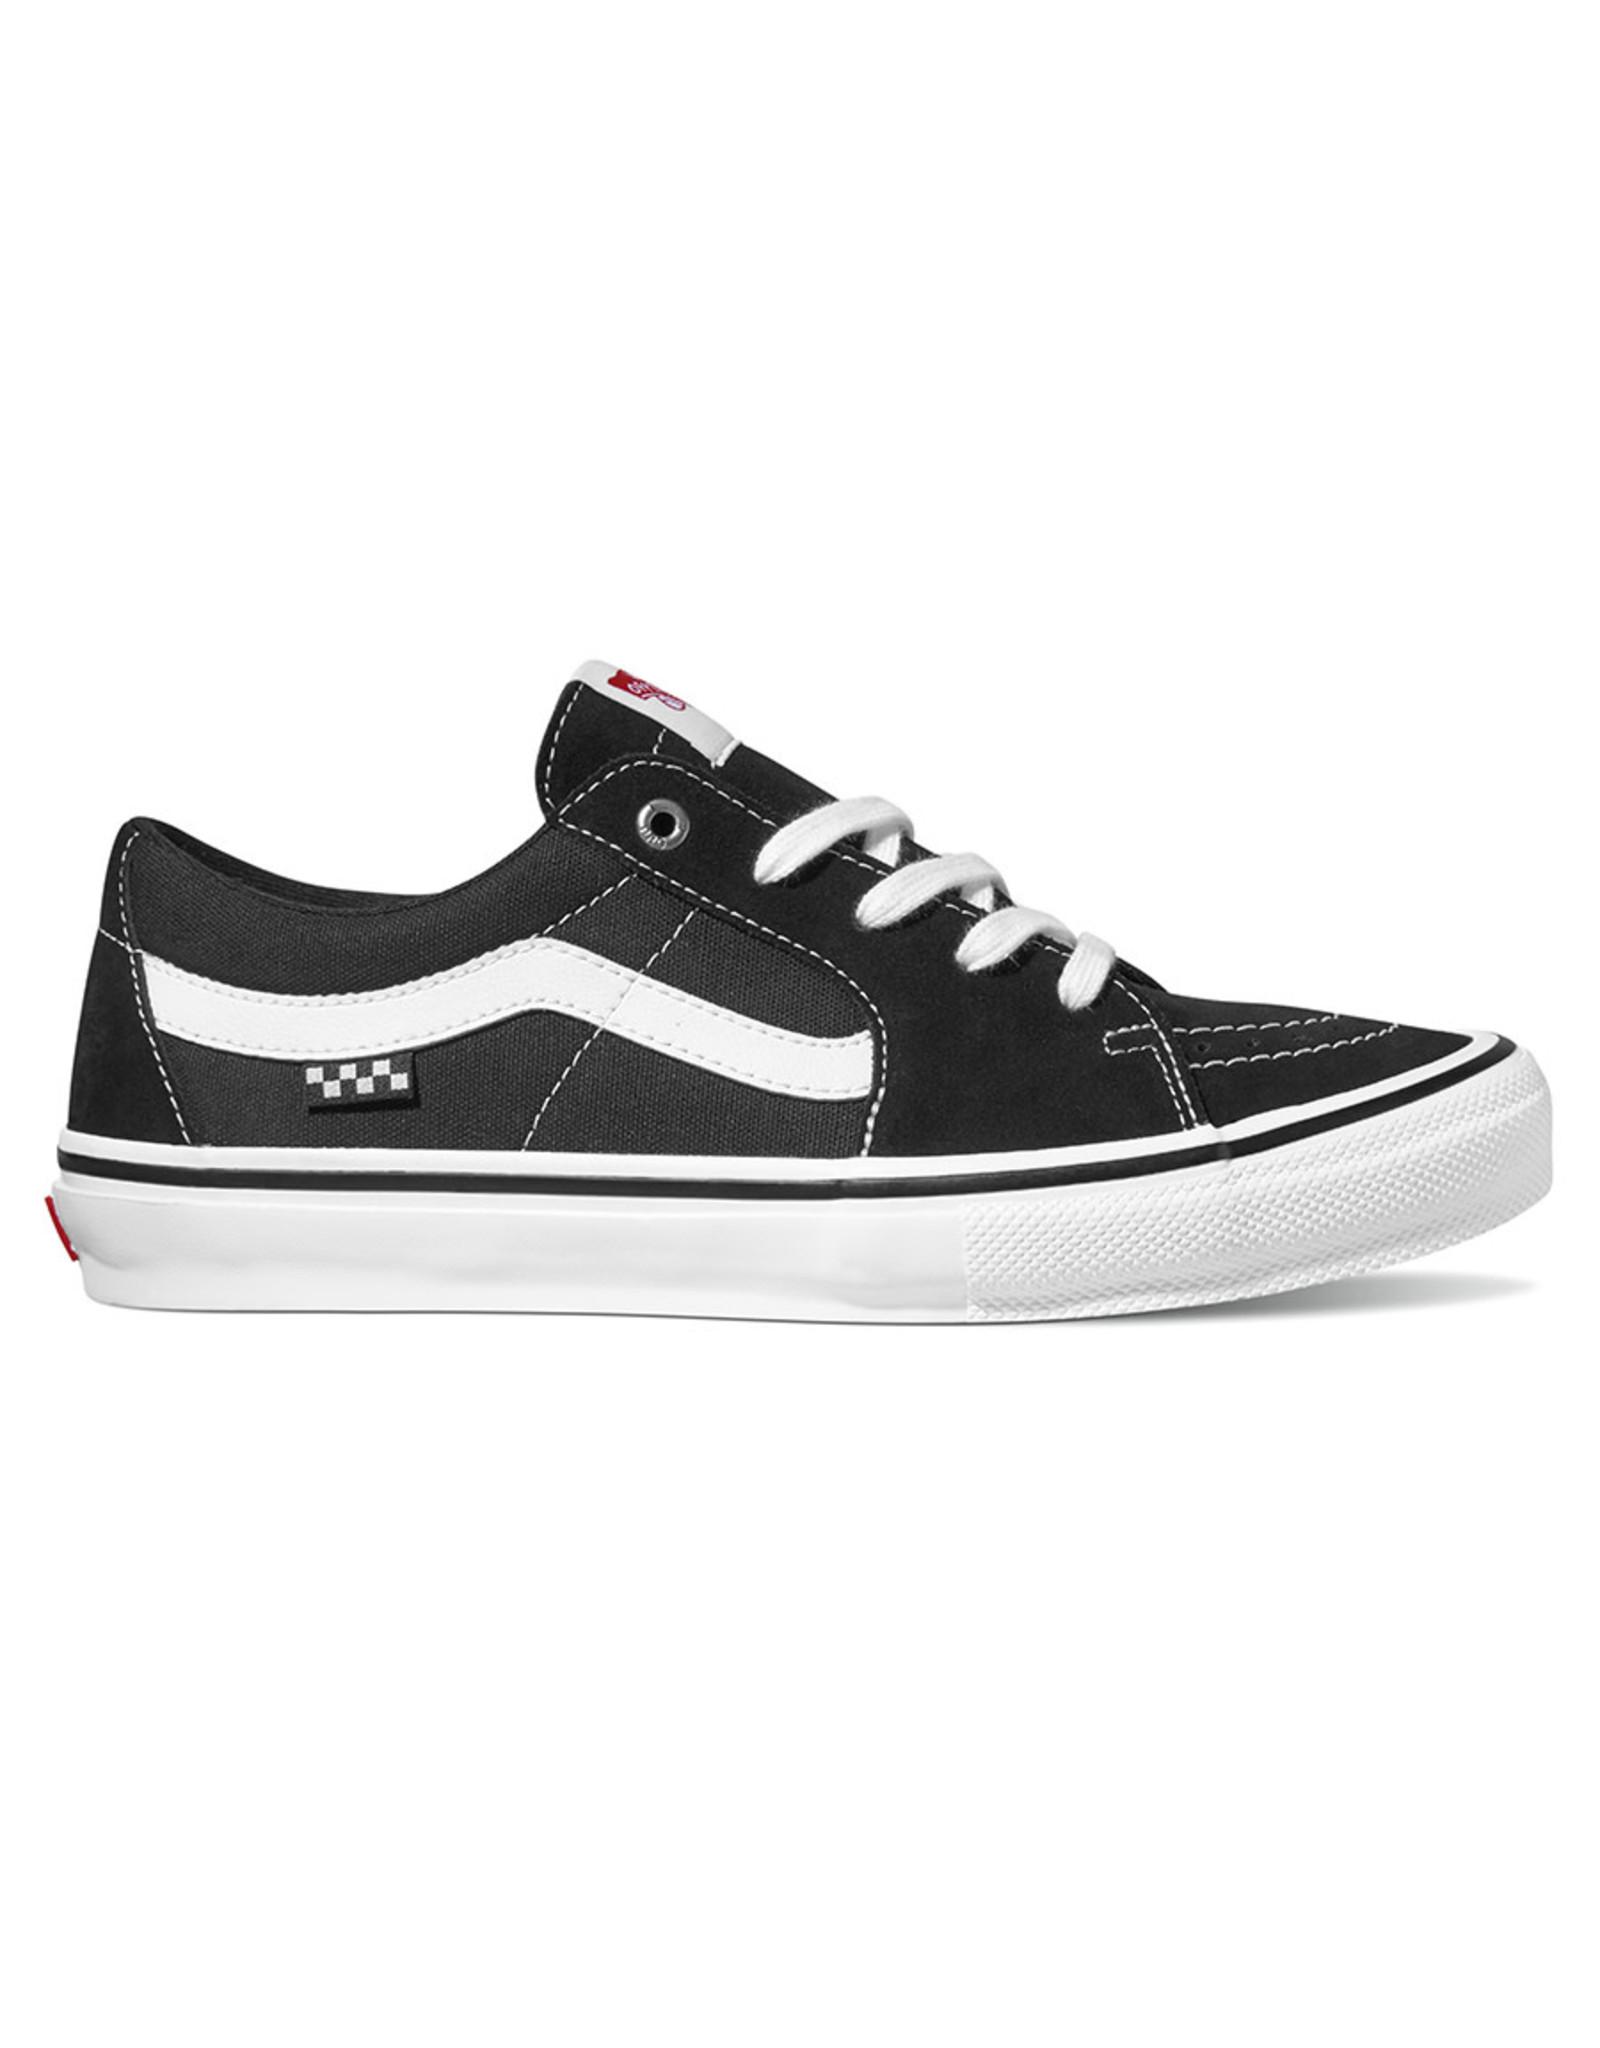 Vans Vans Shoe Skate Low (Black/White)